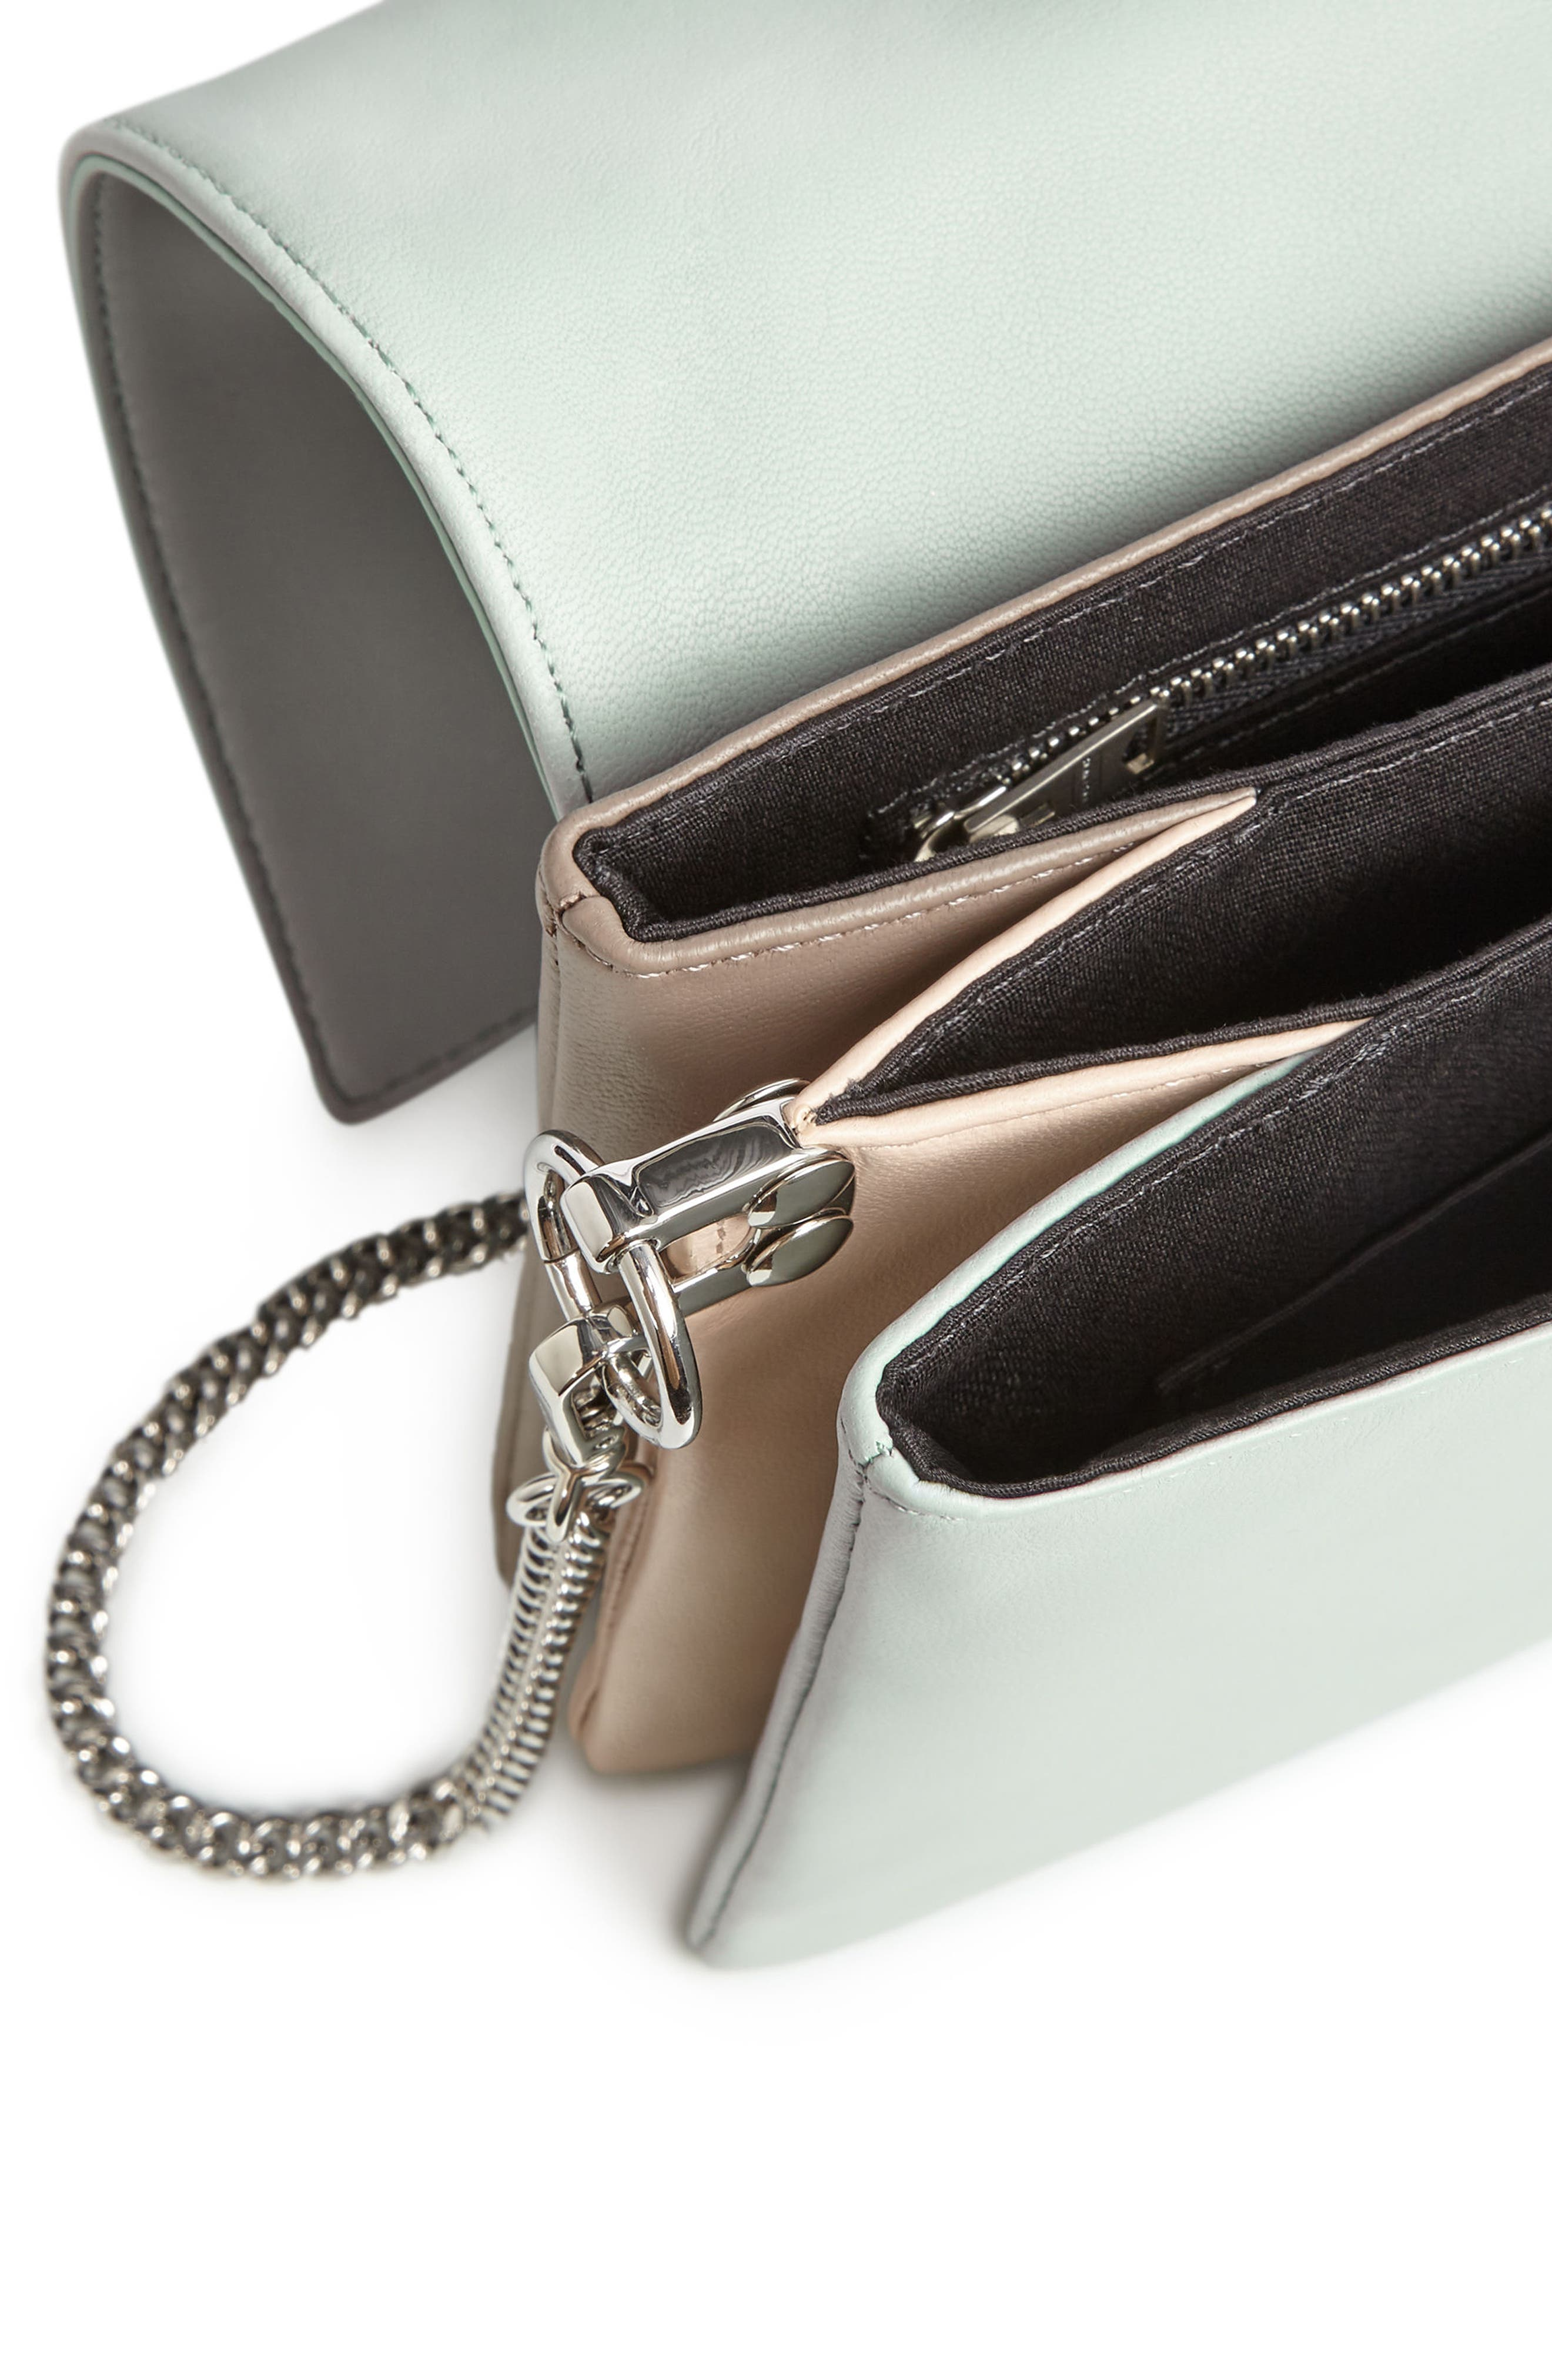 Zep Colorblock Leather Shoulder Bag,                             Alternate thumbnail 3, color,                             MINT GREEN